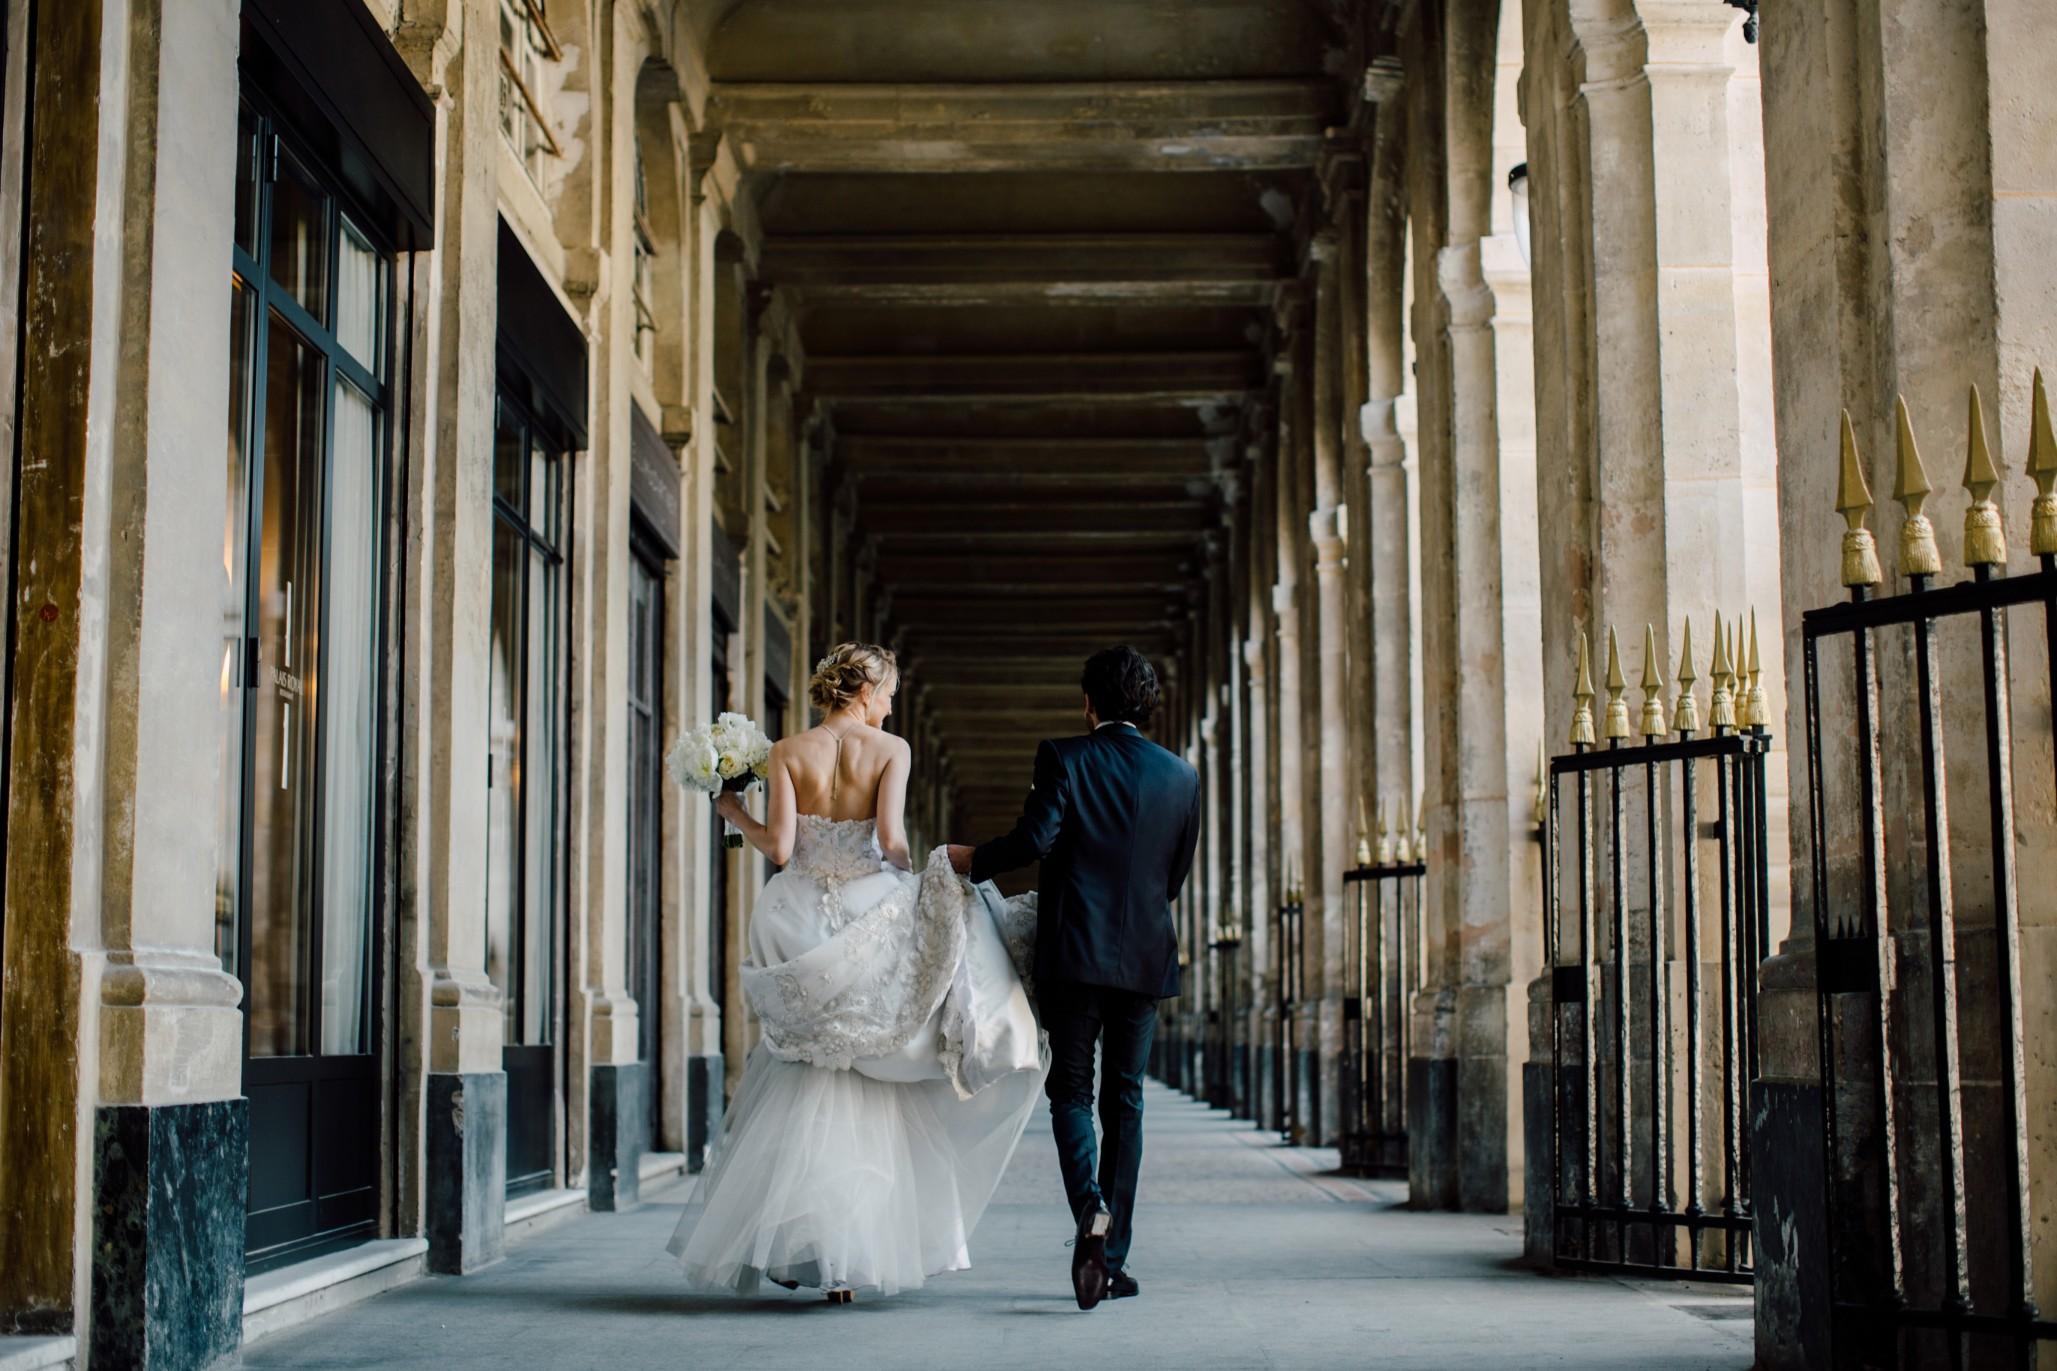 wedding-day_t20_goJY7d.jpg